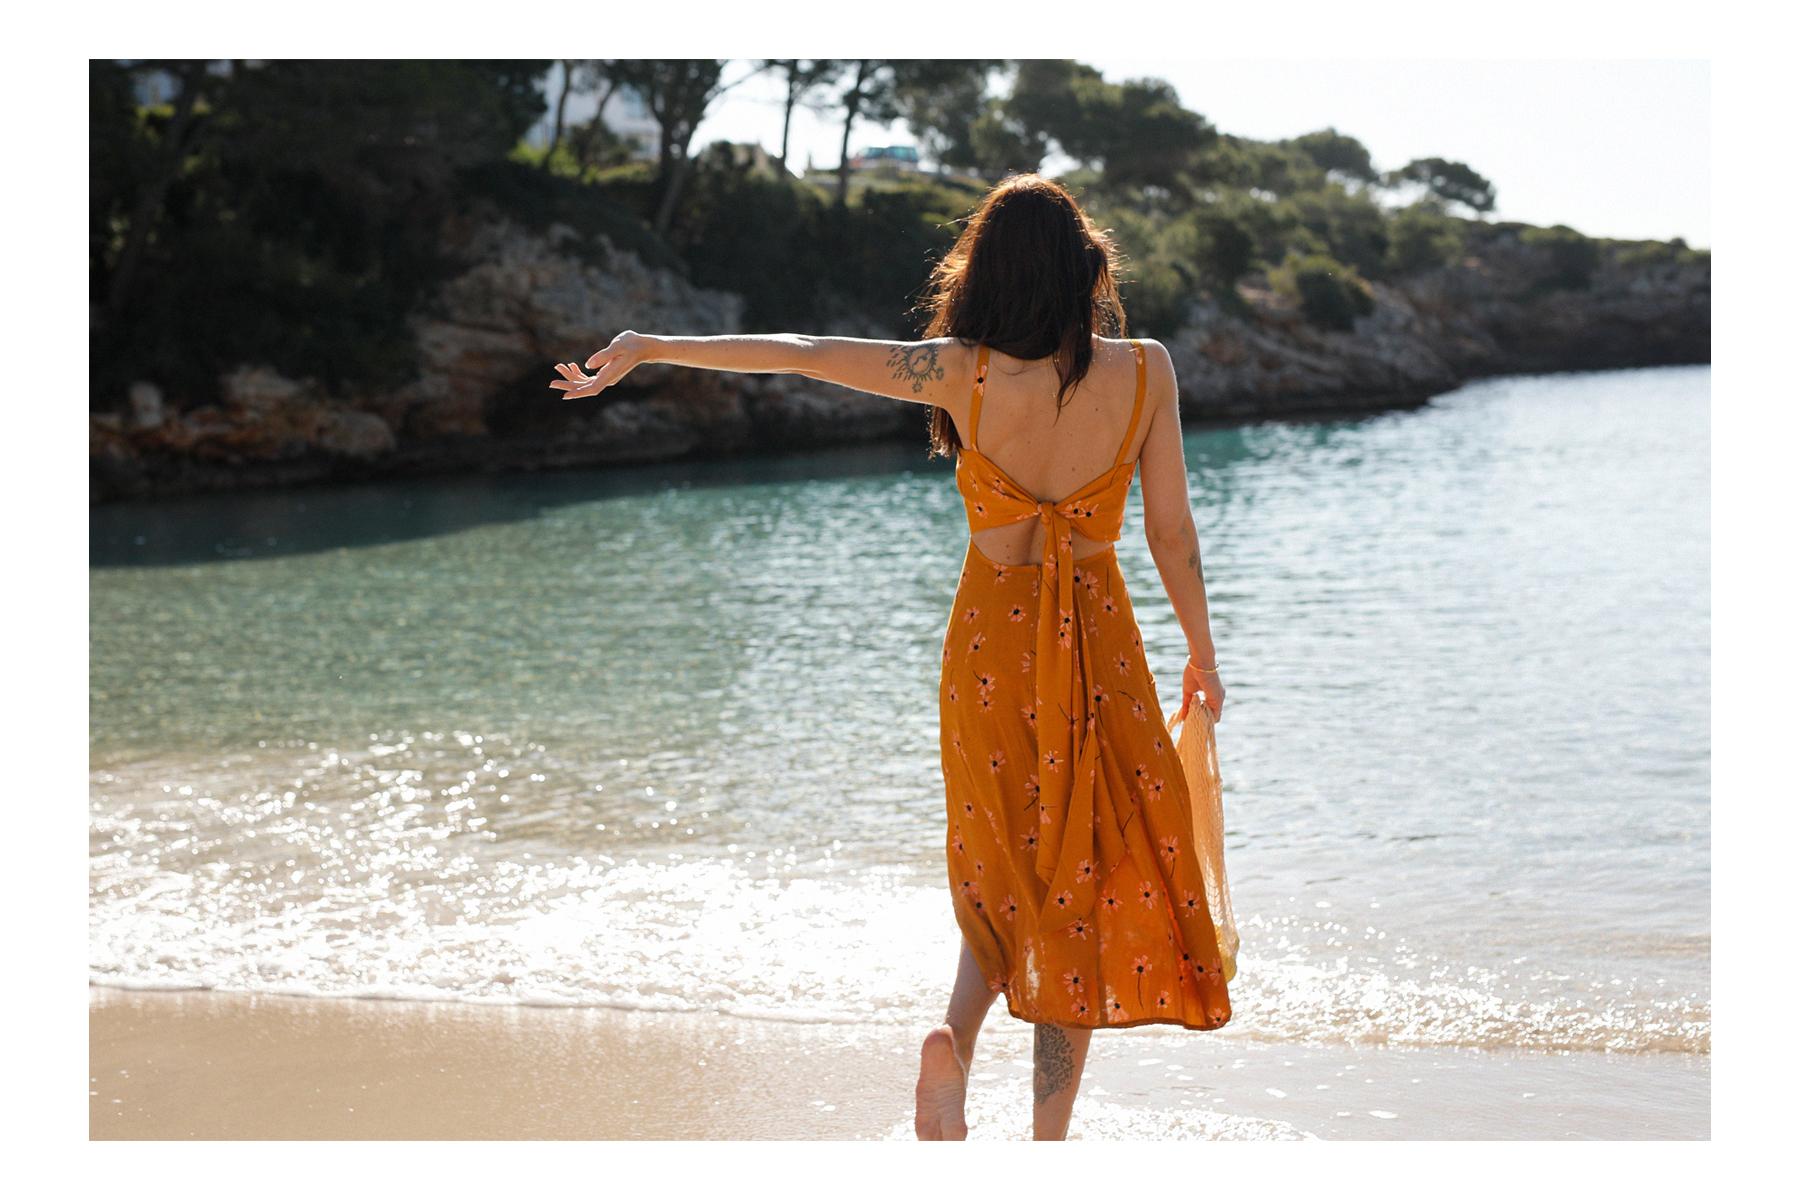 mallorca cala d'or esmeralda beach outfit ootd mood strand shooting mode fashionblogger blogger reiseblog fauthfull the brand asos kleid ocker ochre style bloggers stylist catsanddogsblog ricarda schernus düsseldorf 4